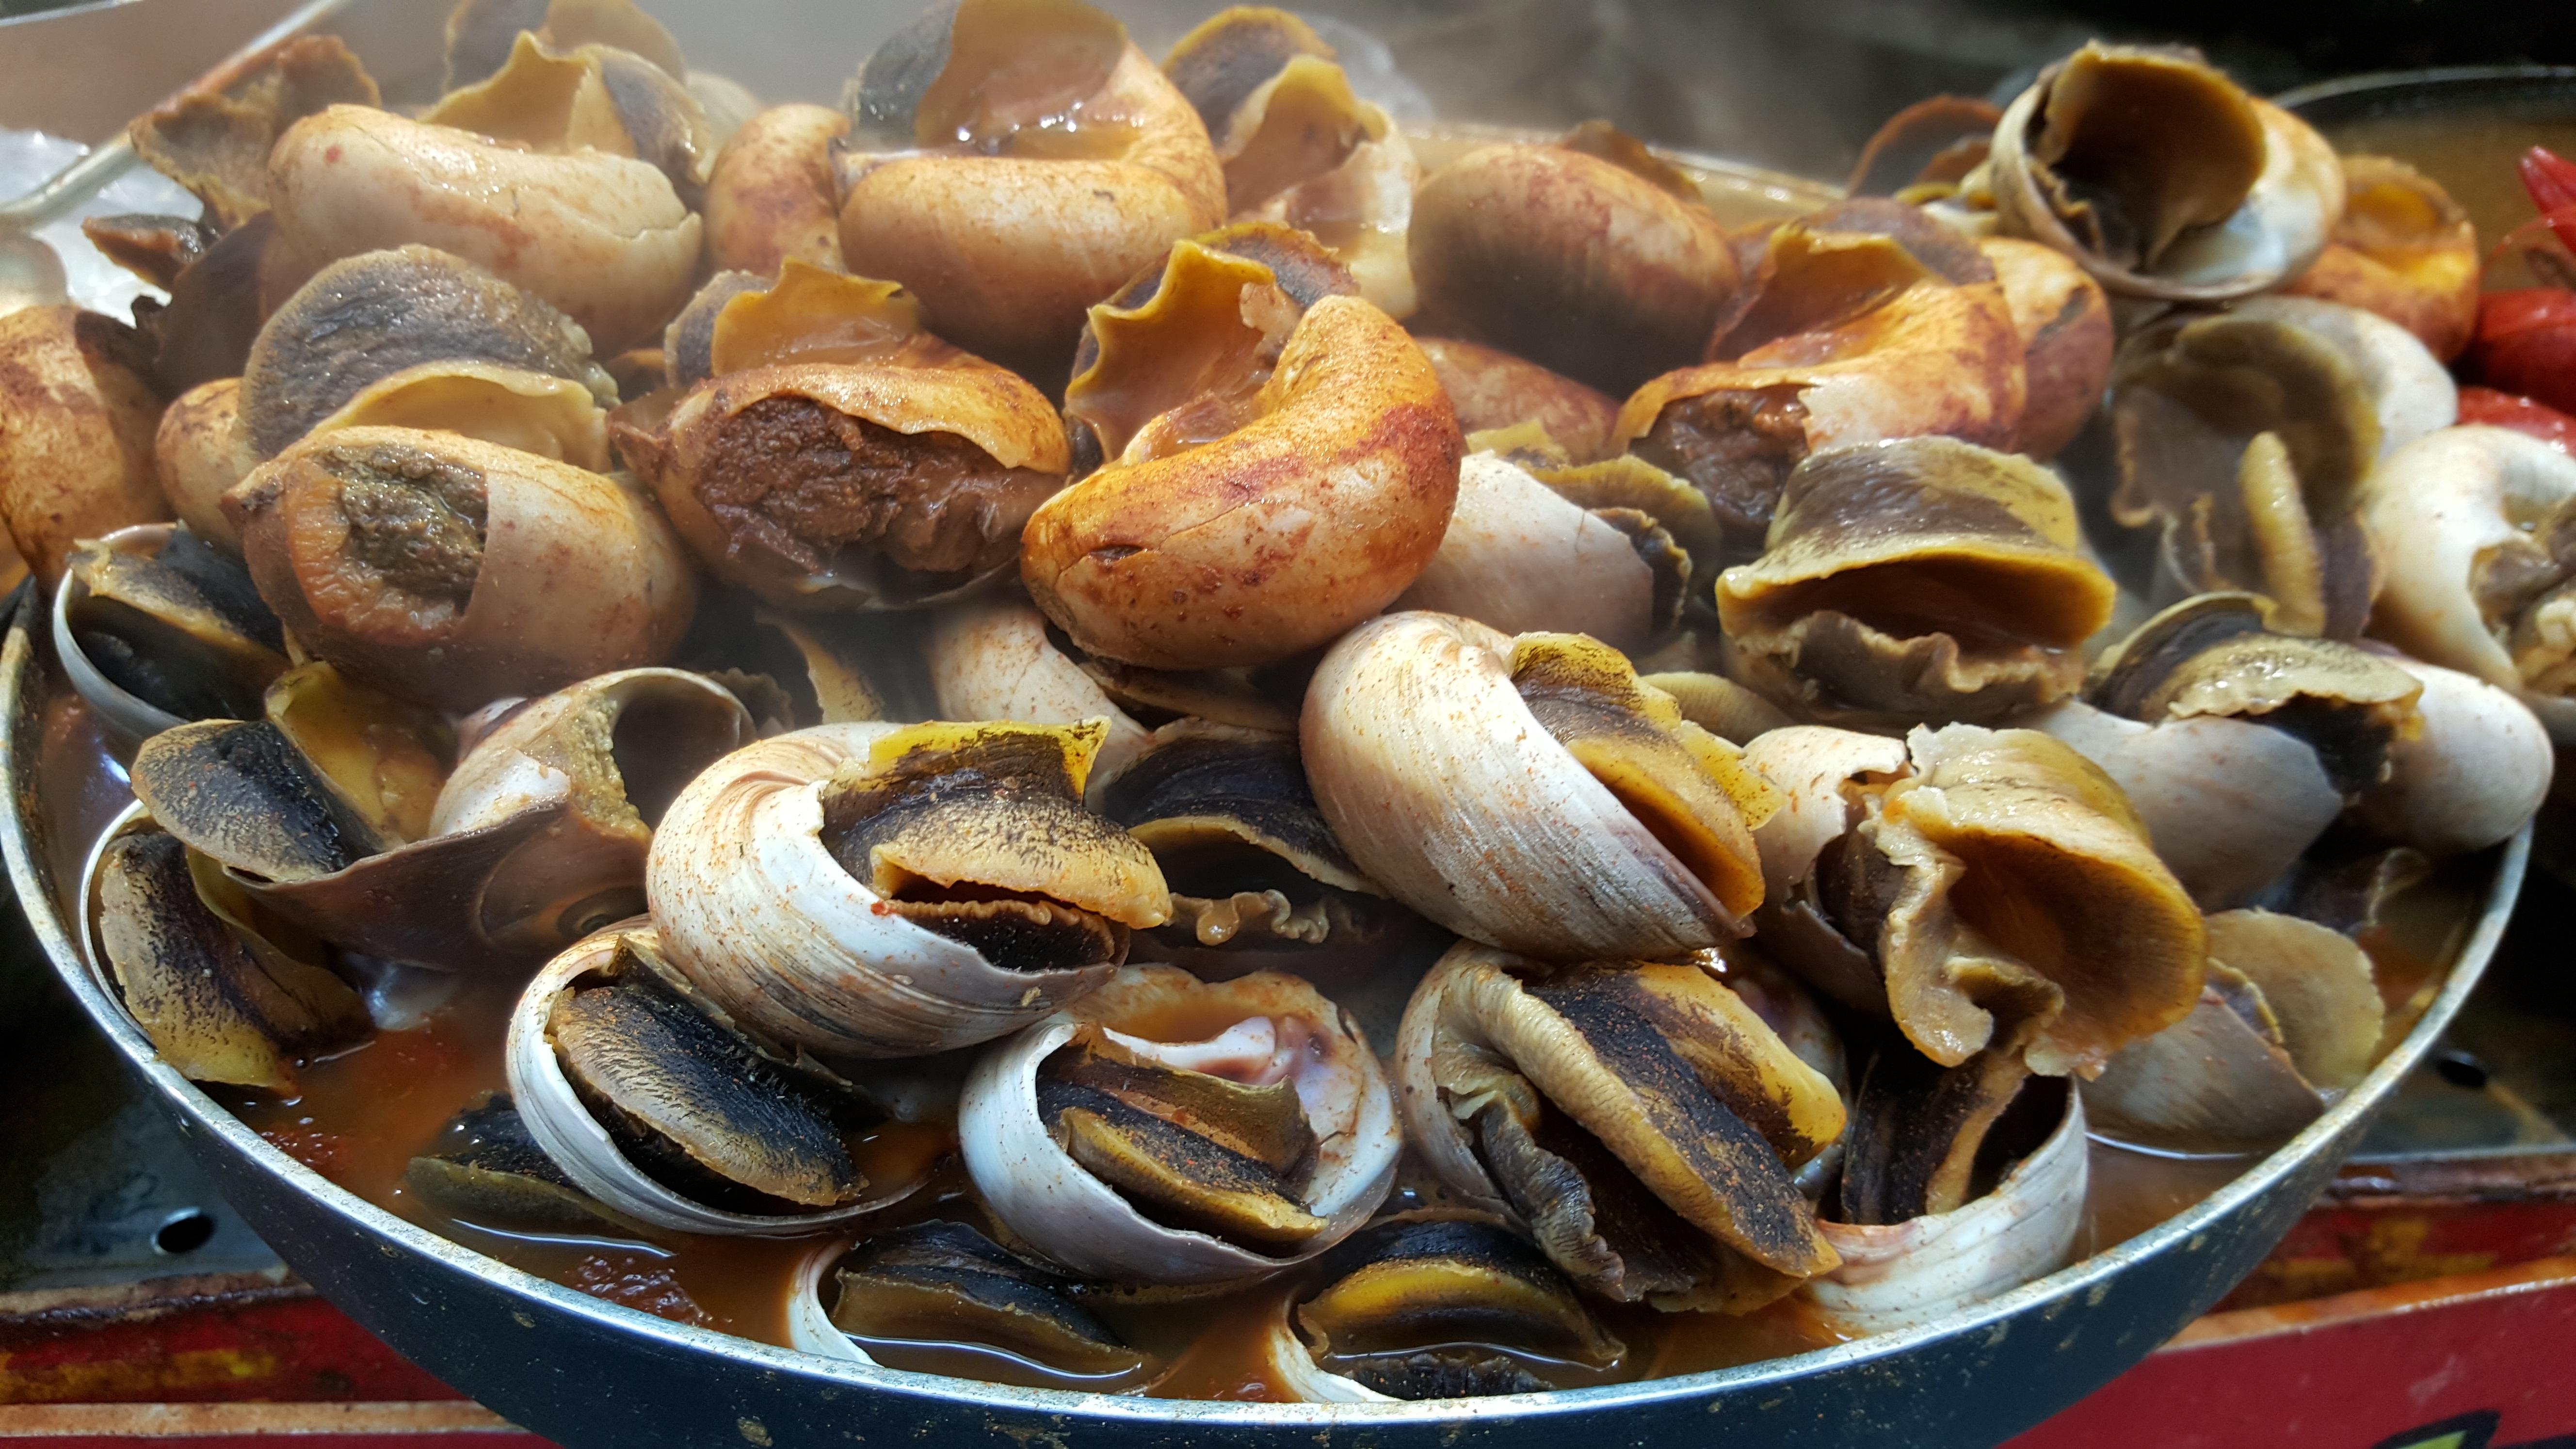 Gambar Hidangan Makanan Laut Masakan Invertebrata Remis Jalan